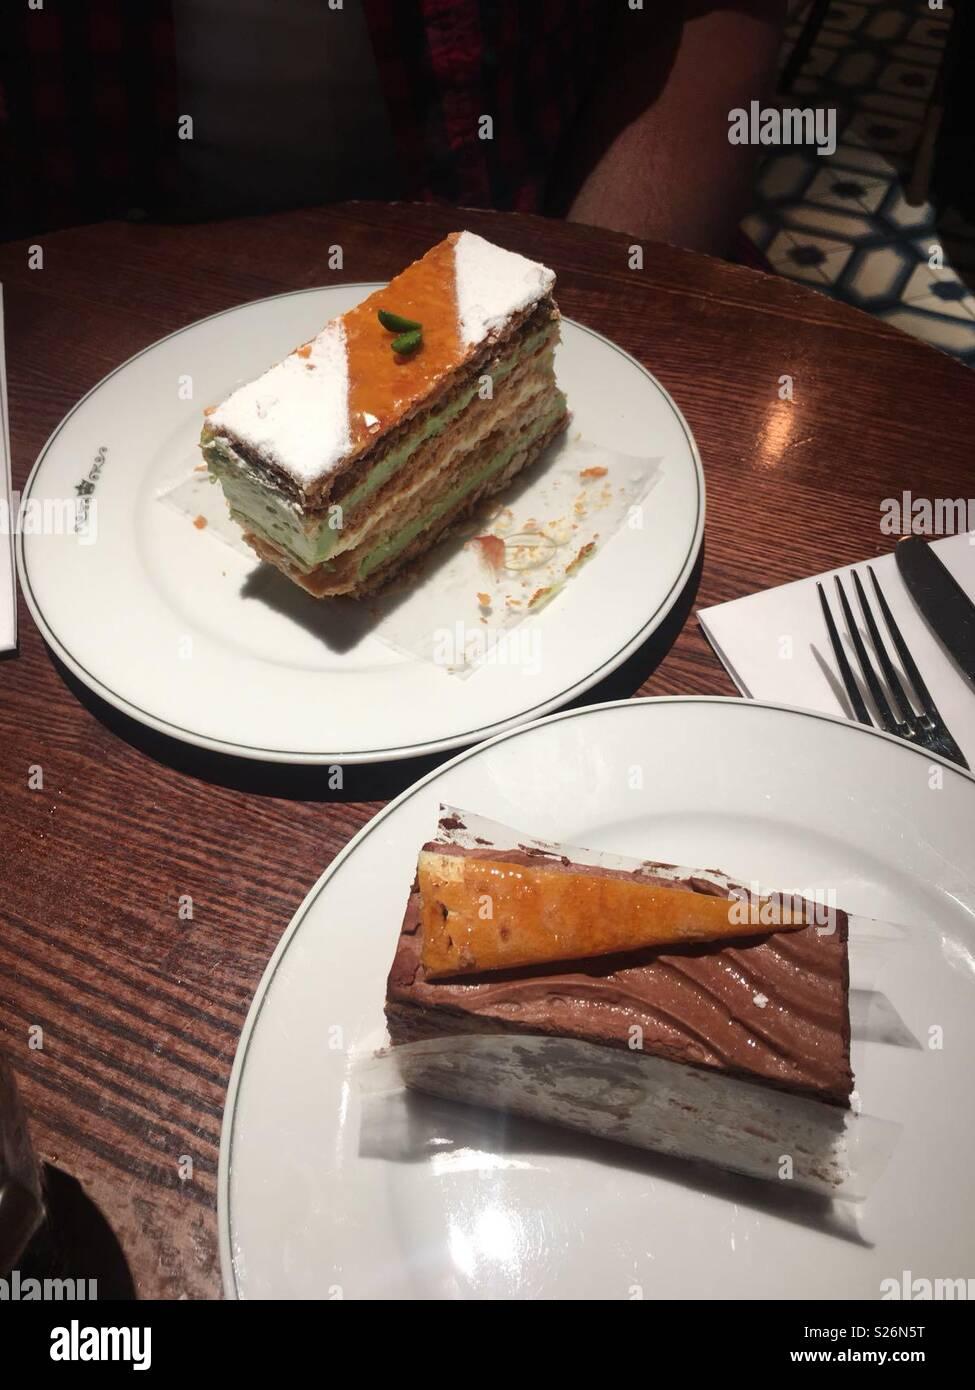 Mmmm cakes - Stock Image